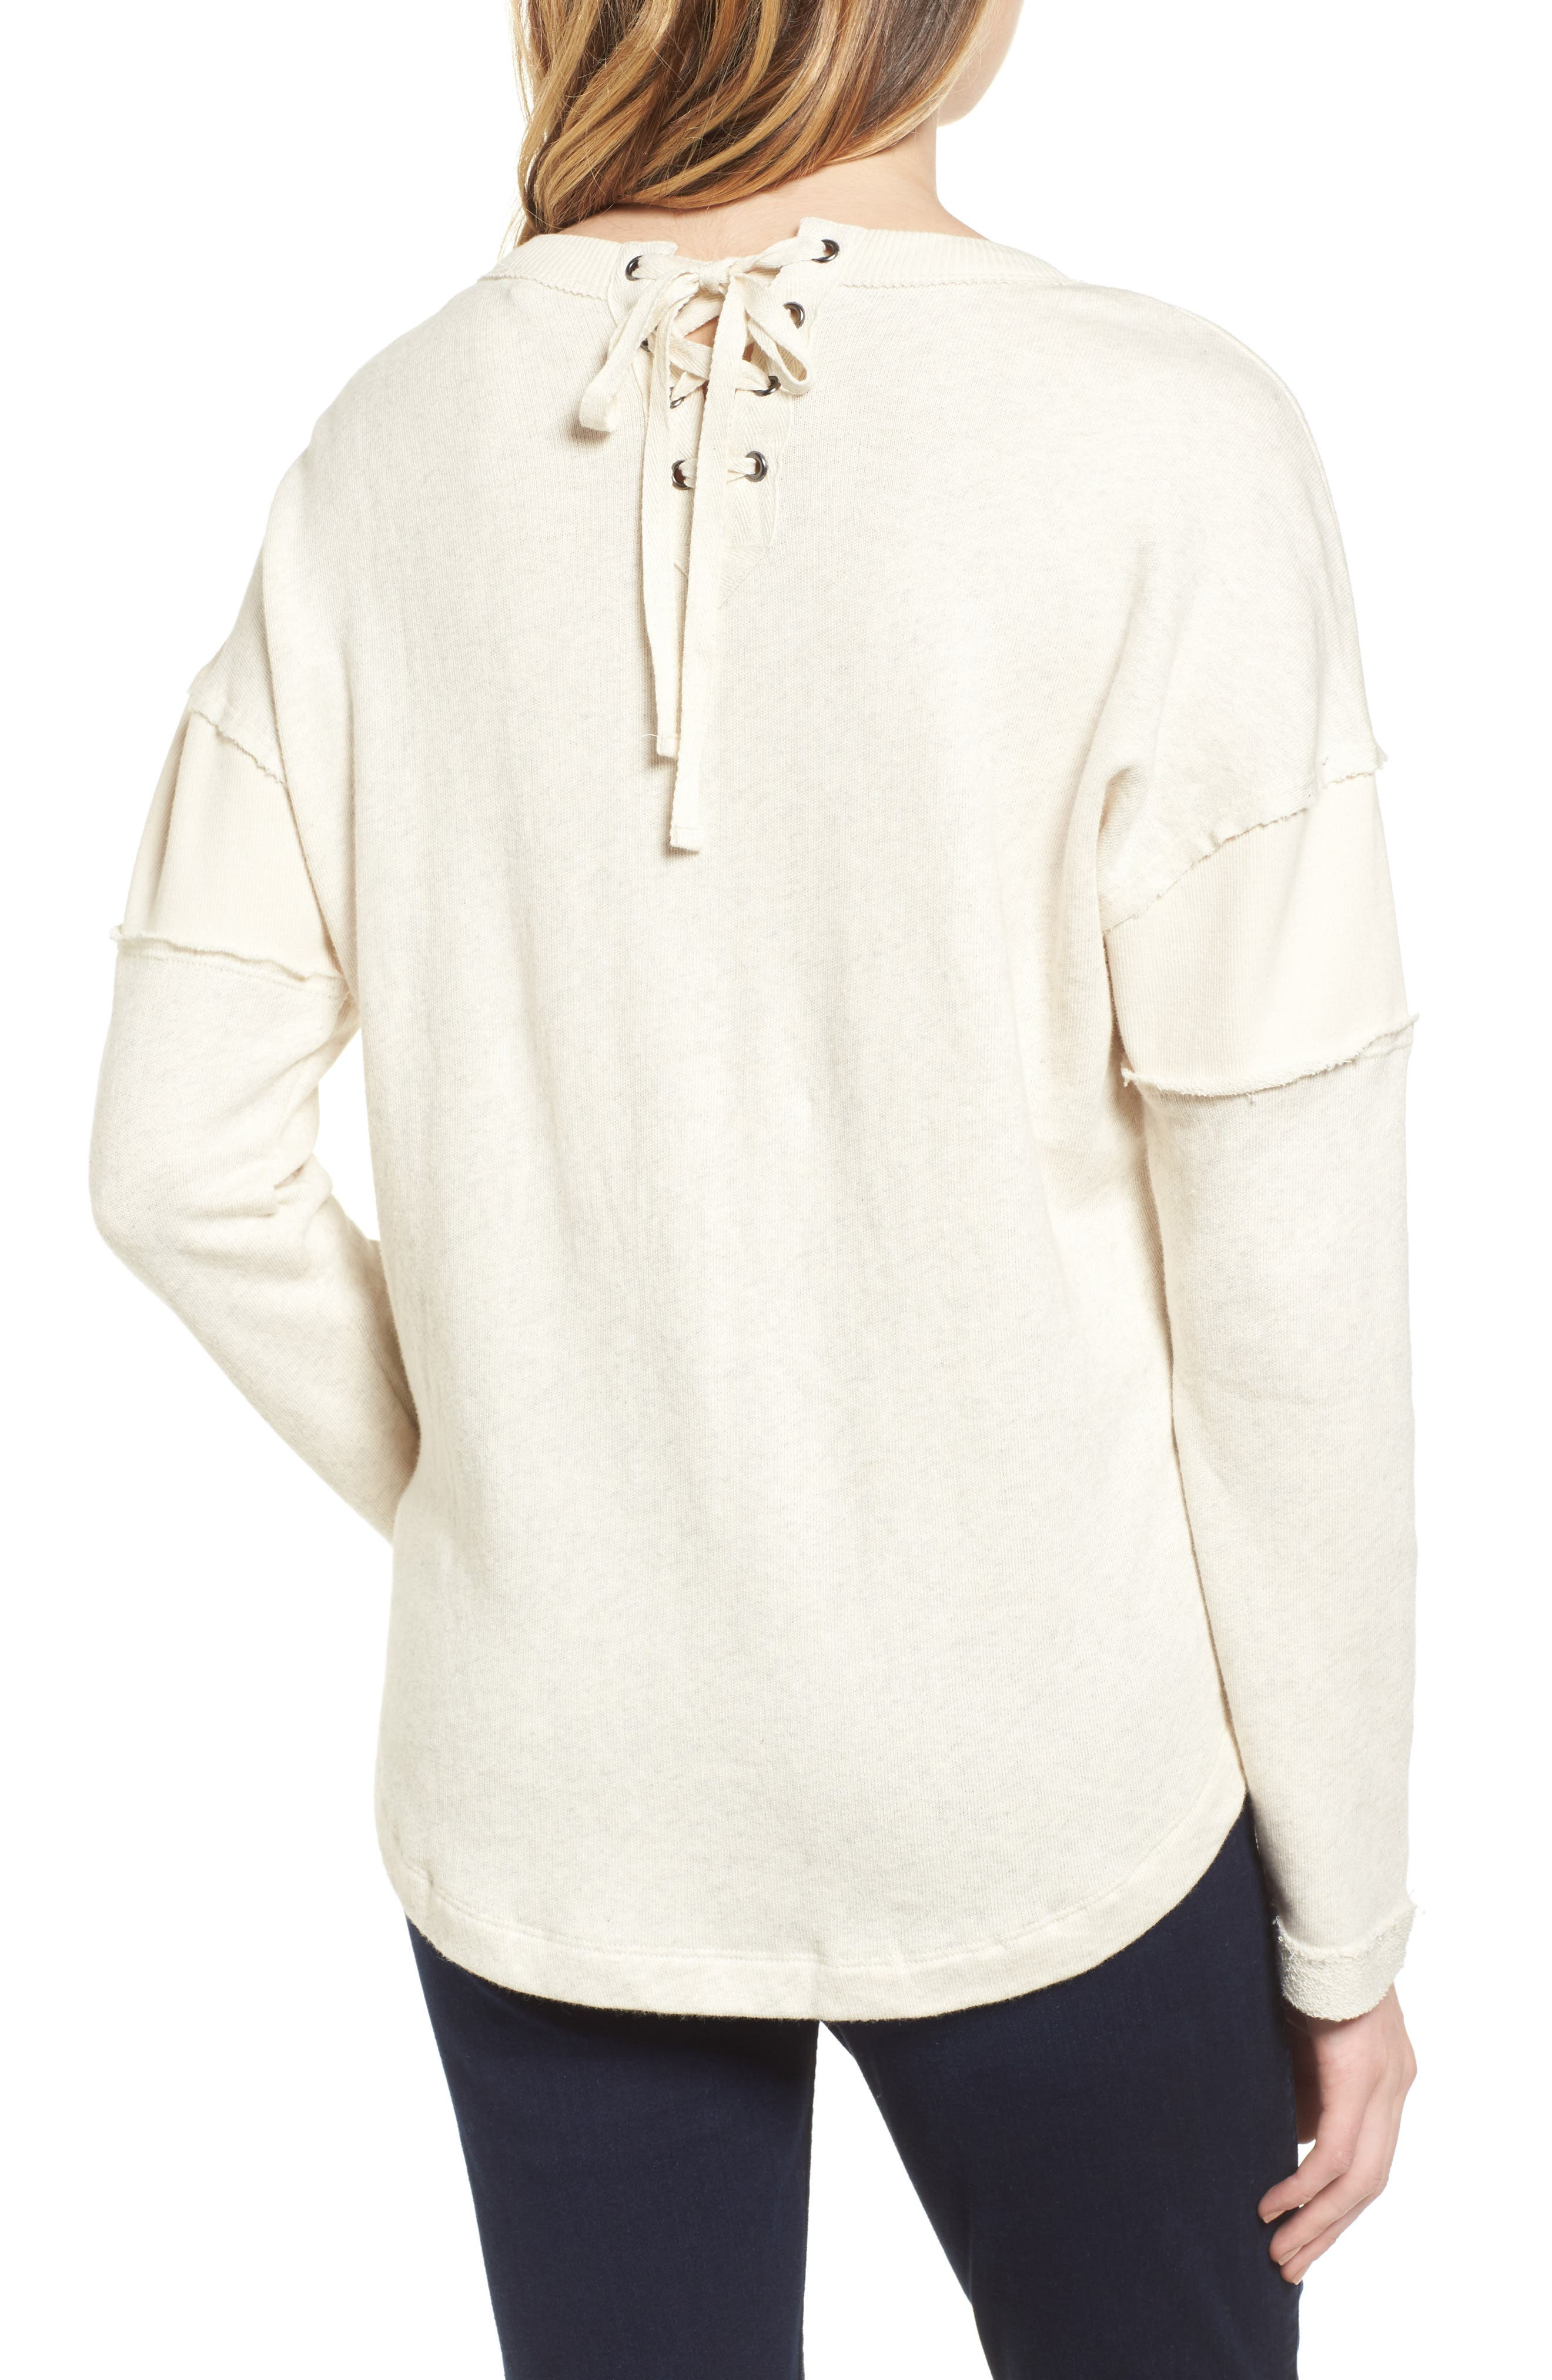 Seabrook Stripe Sweatshirt,                             Alternate thumbnail 2, color,                             909